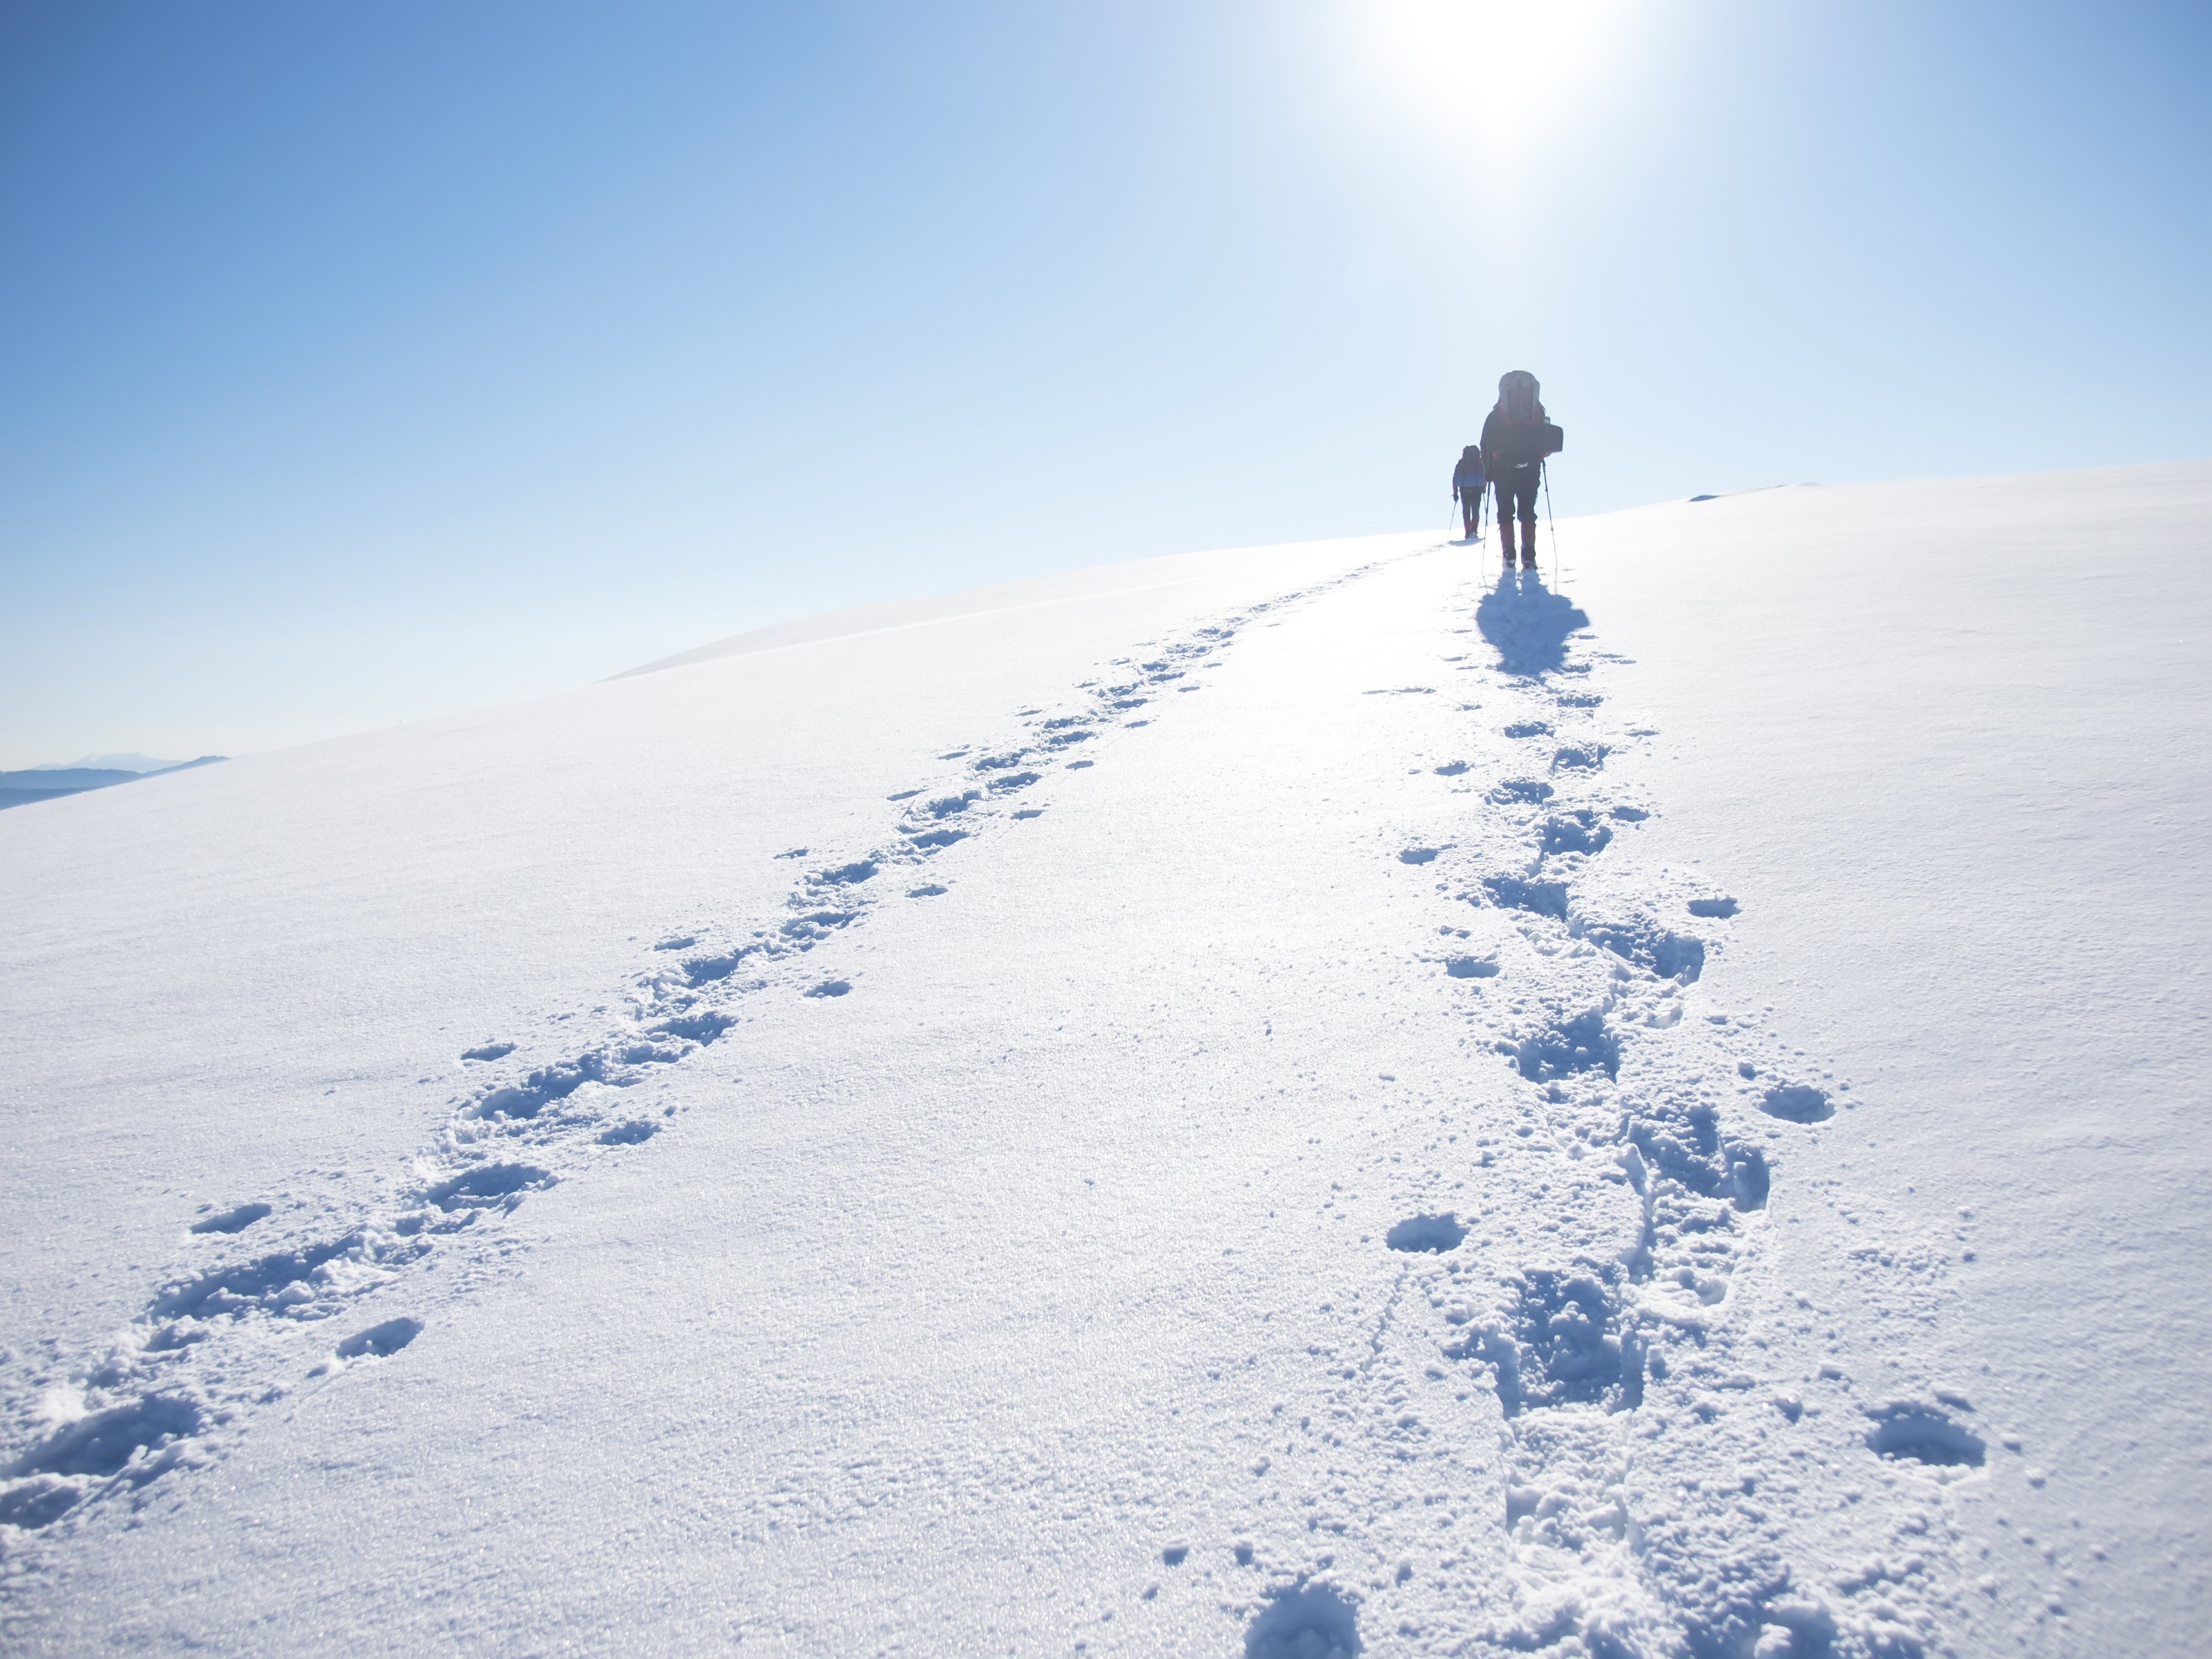 Man walking up a ski slope | Photo: Shutterstock